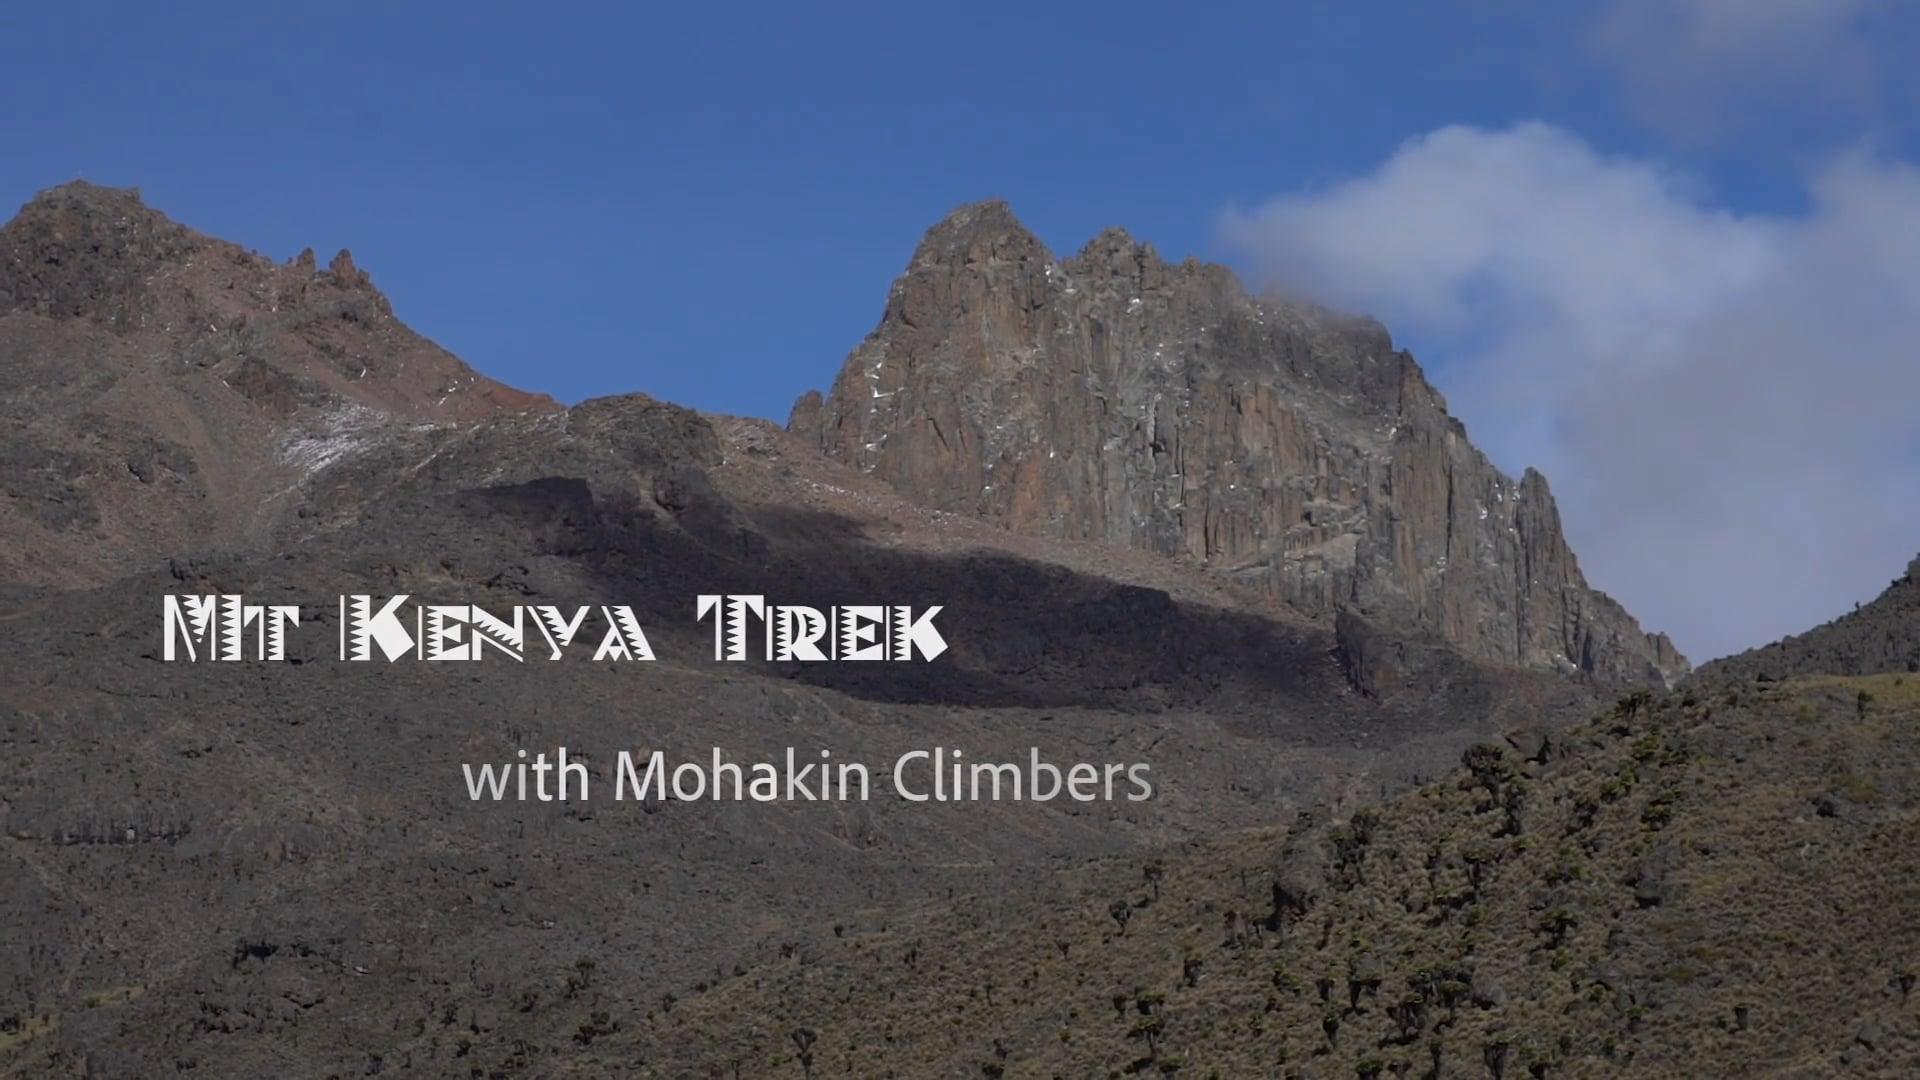 Mt Kenya Trek - Mohakin Climbers